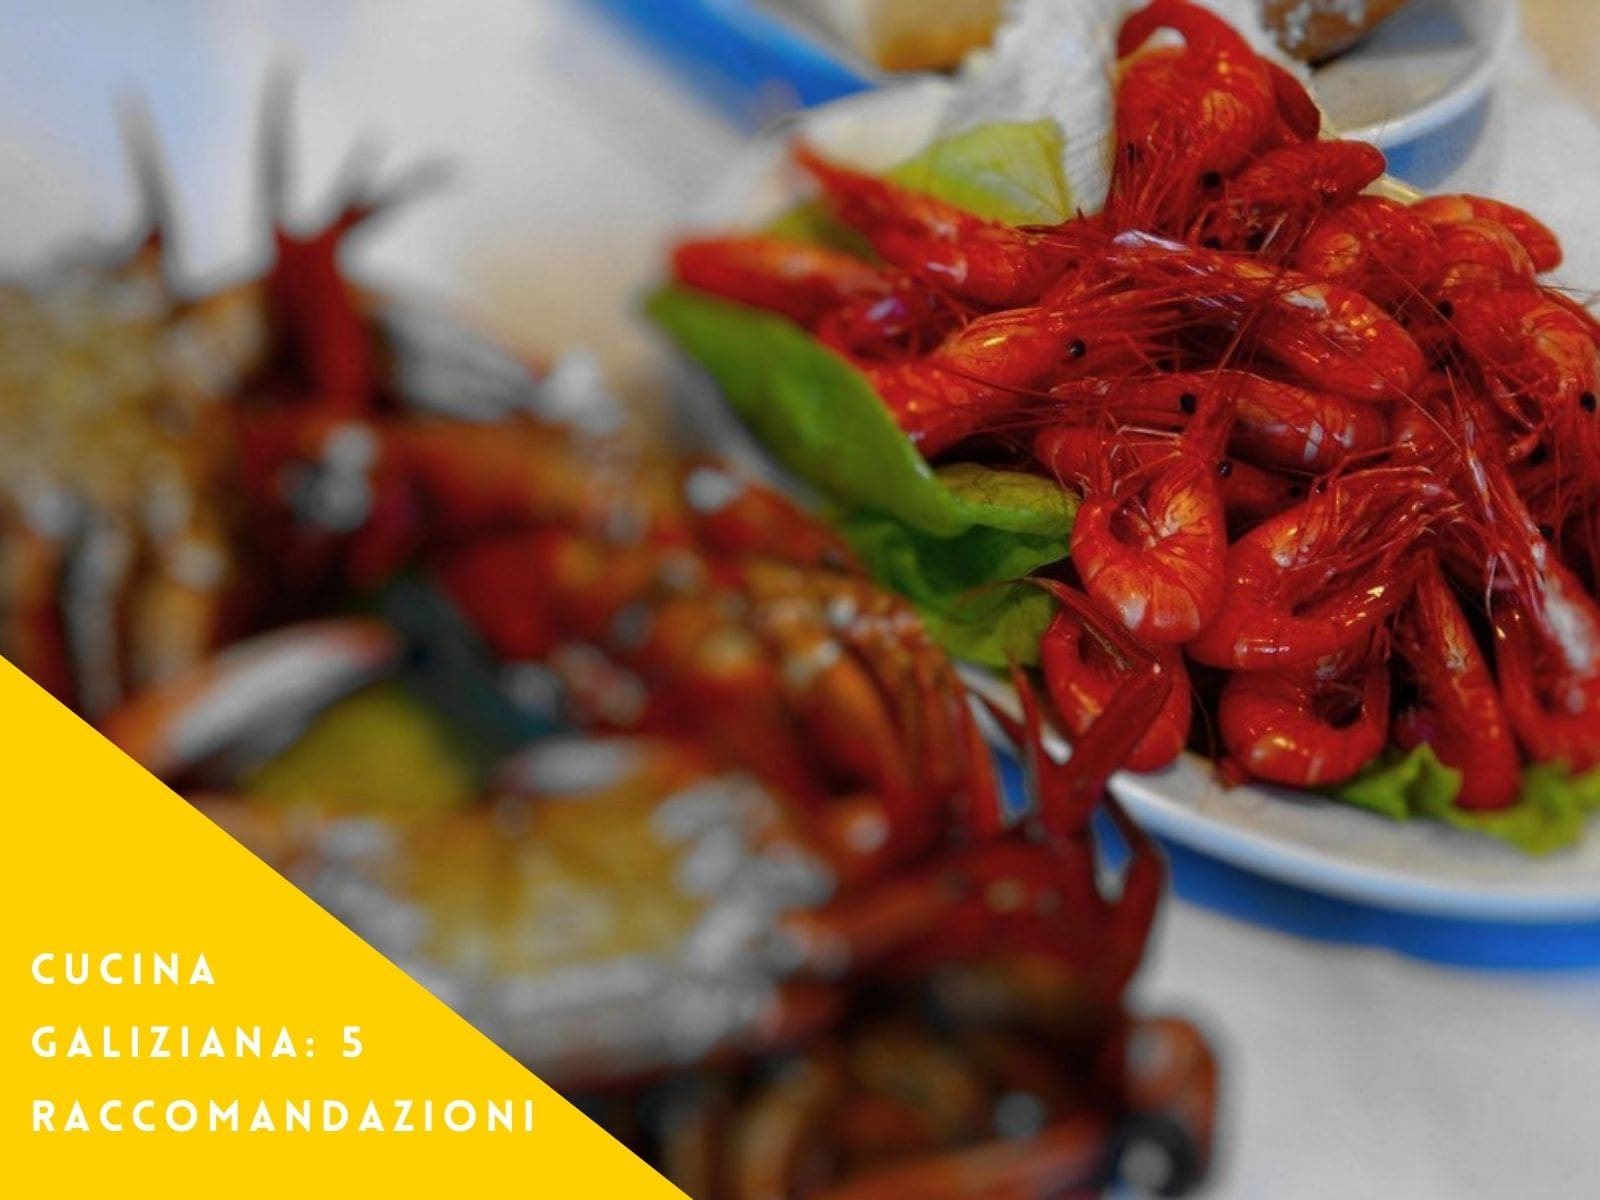 Cucina galiziana: 5 raccomandazioni